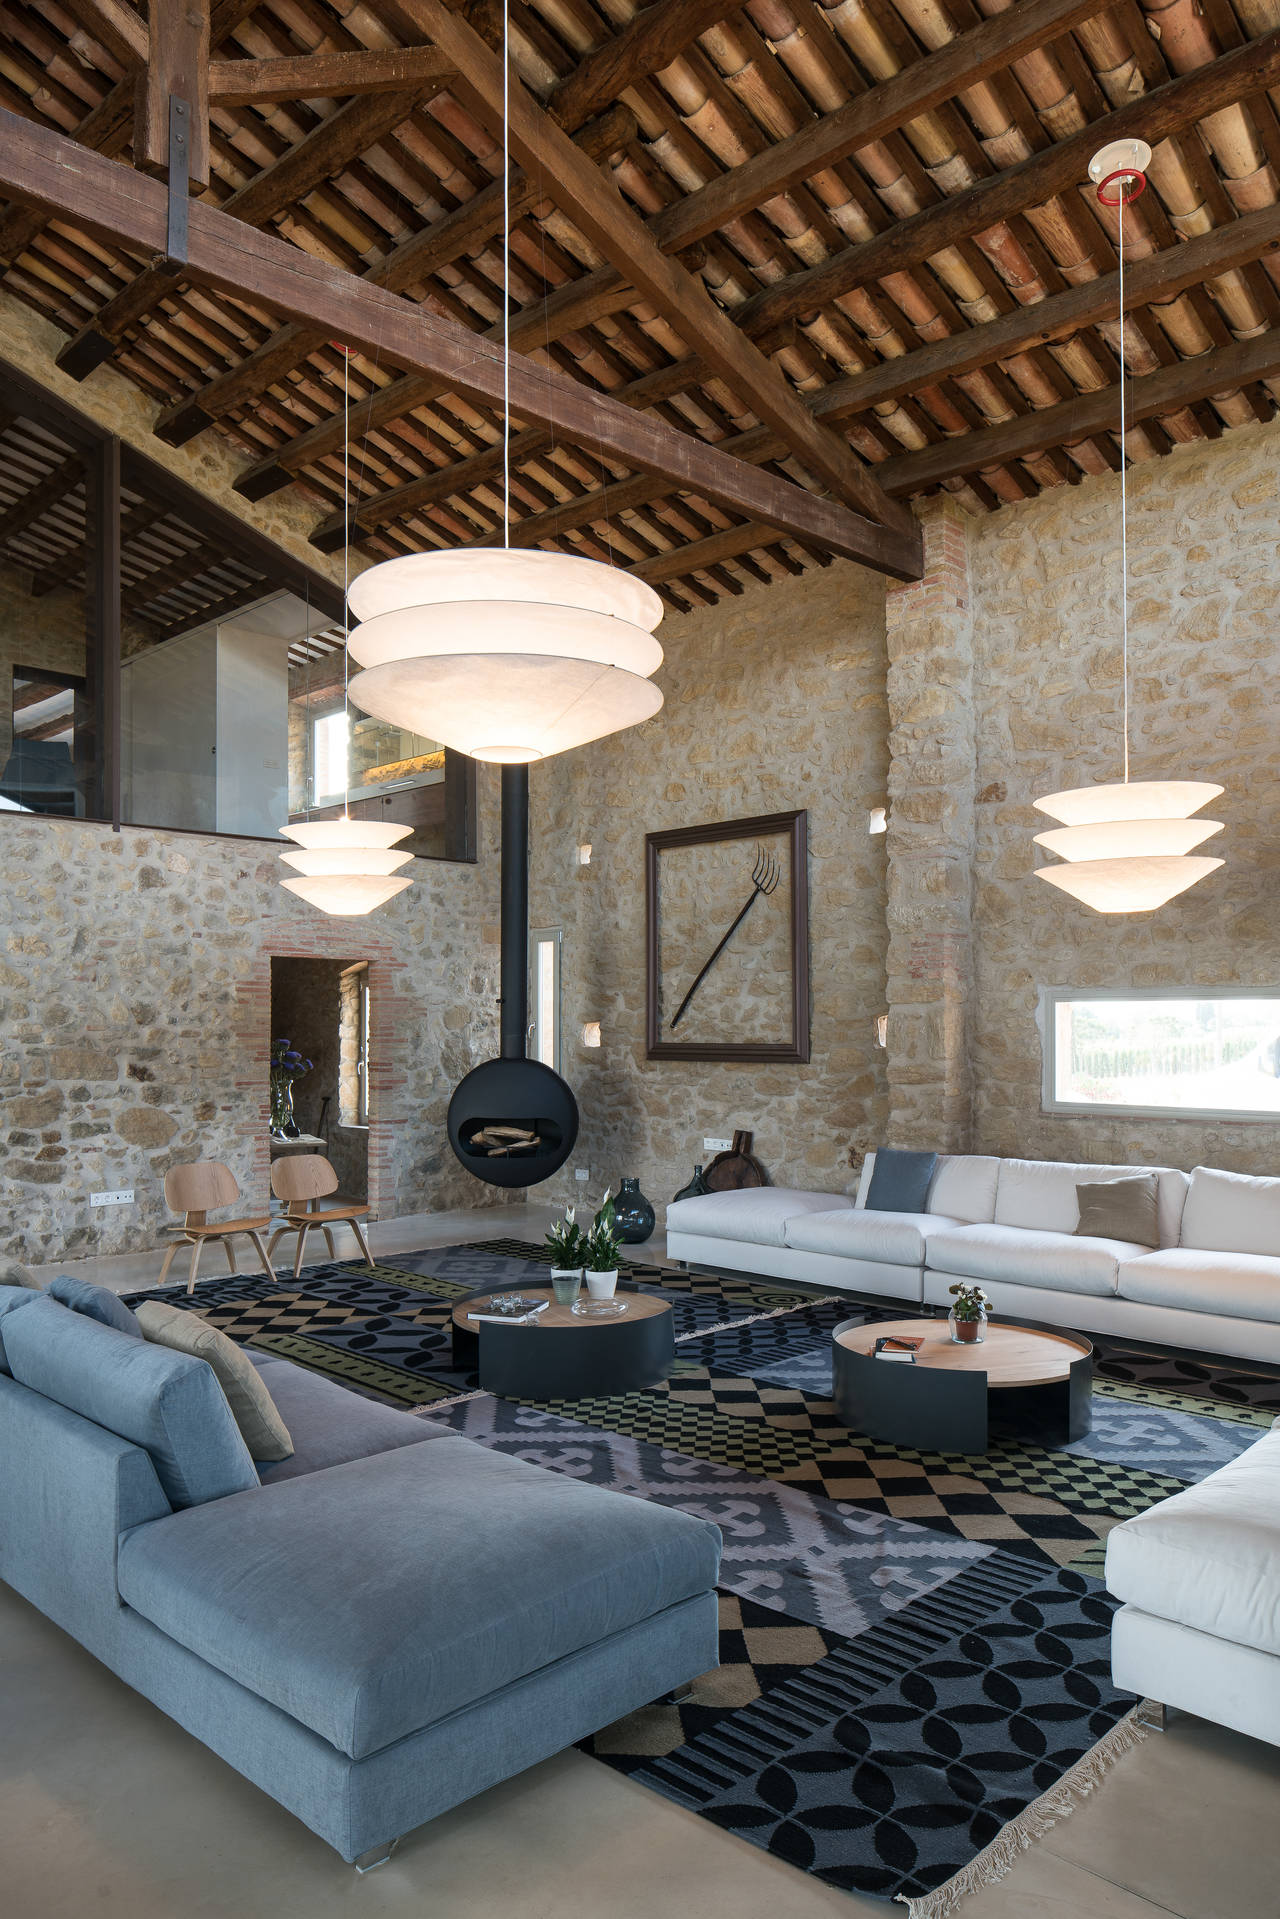 Antrax per un casale a Girona (Spagna)